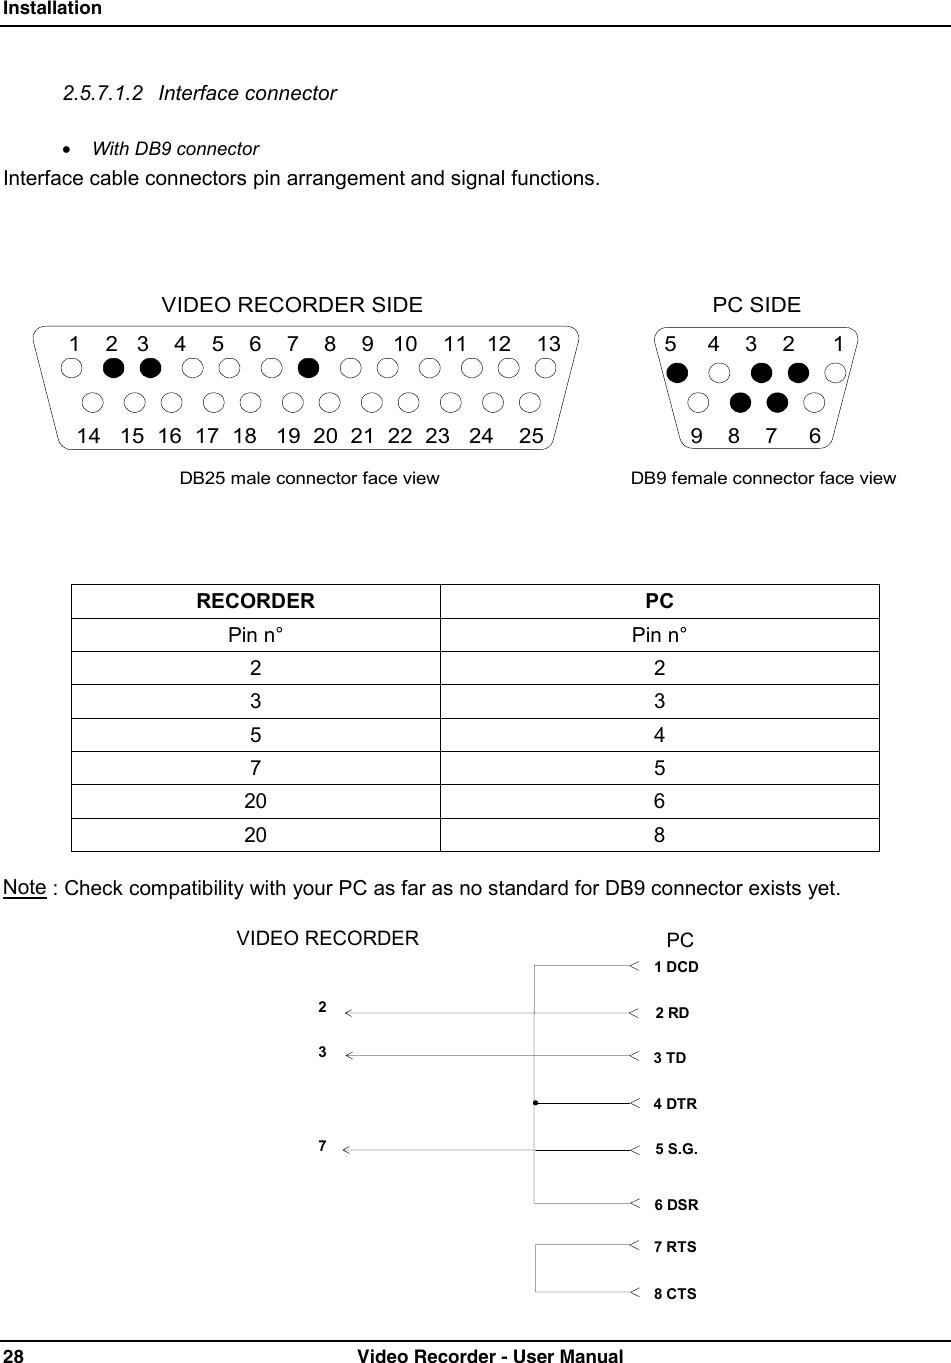 Honeywell Vrx180 Users Manual DPR 180